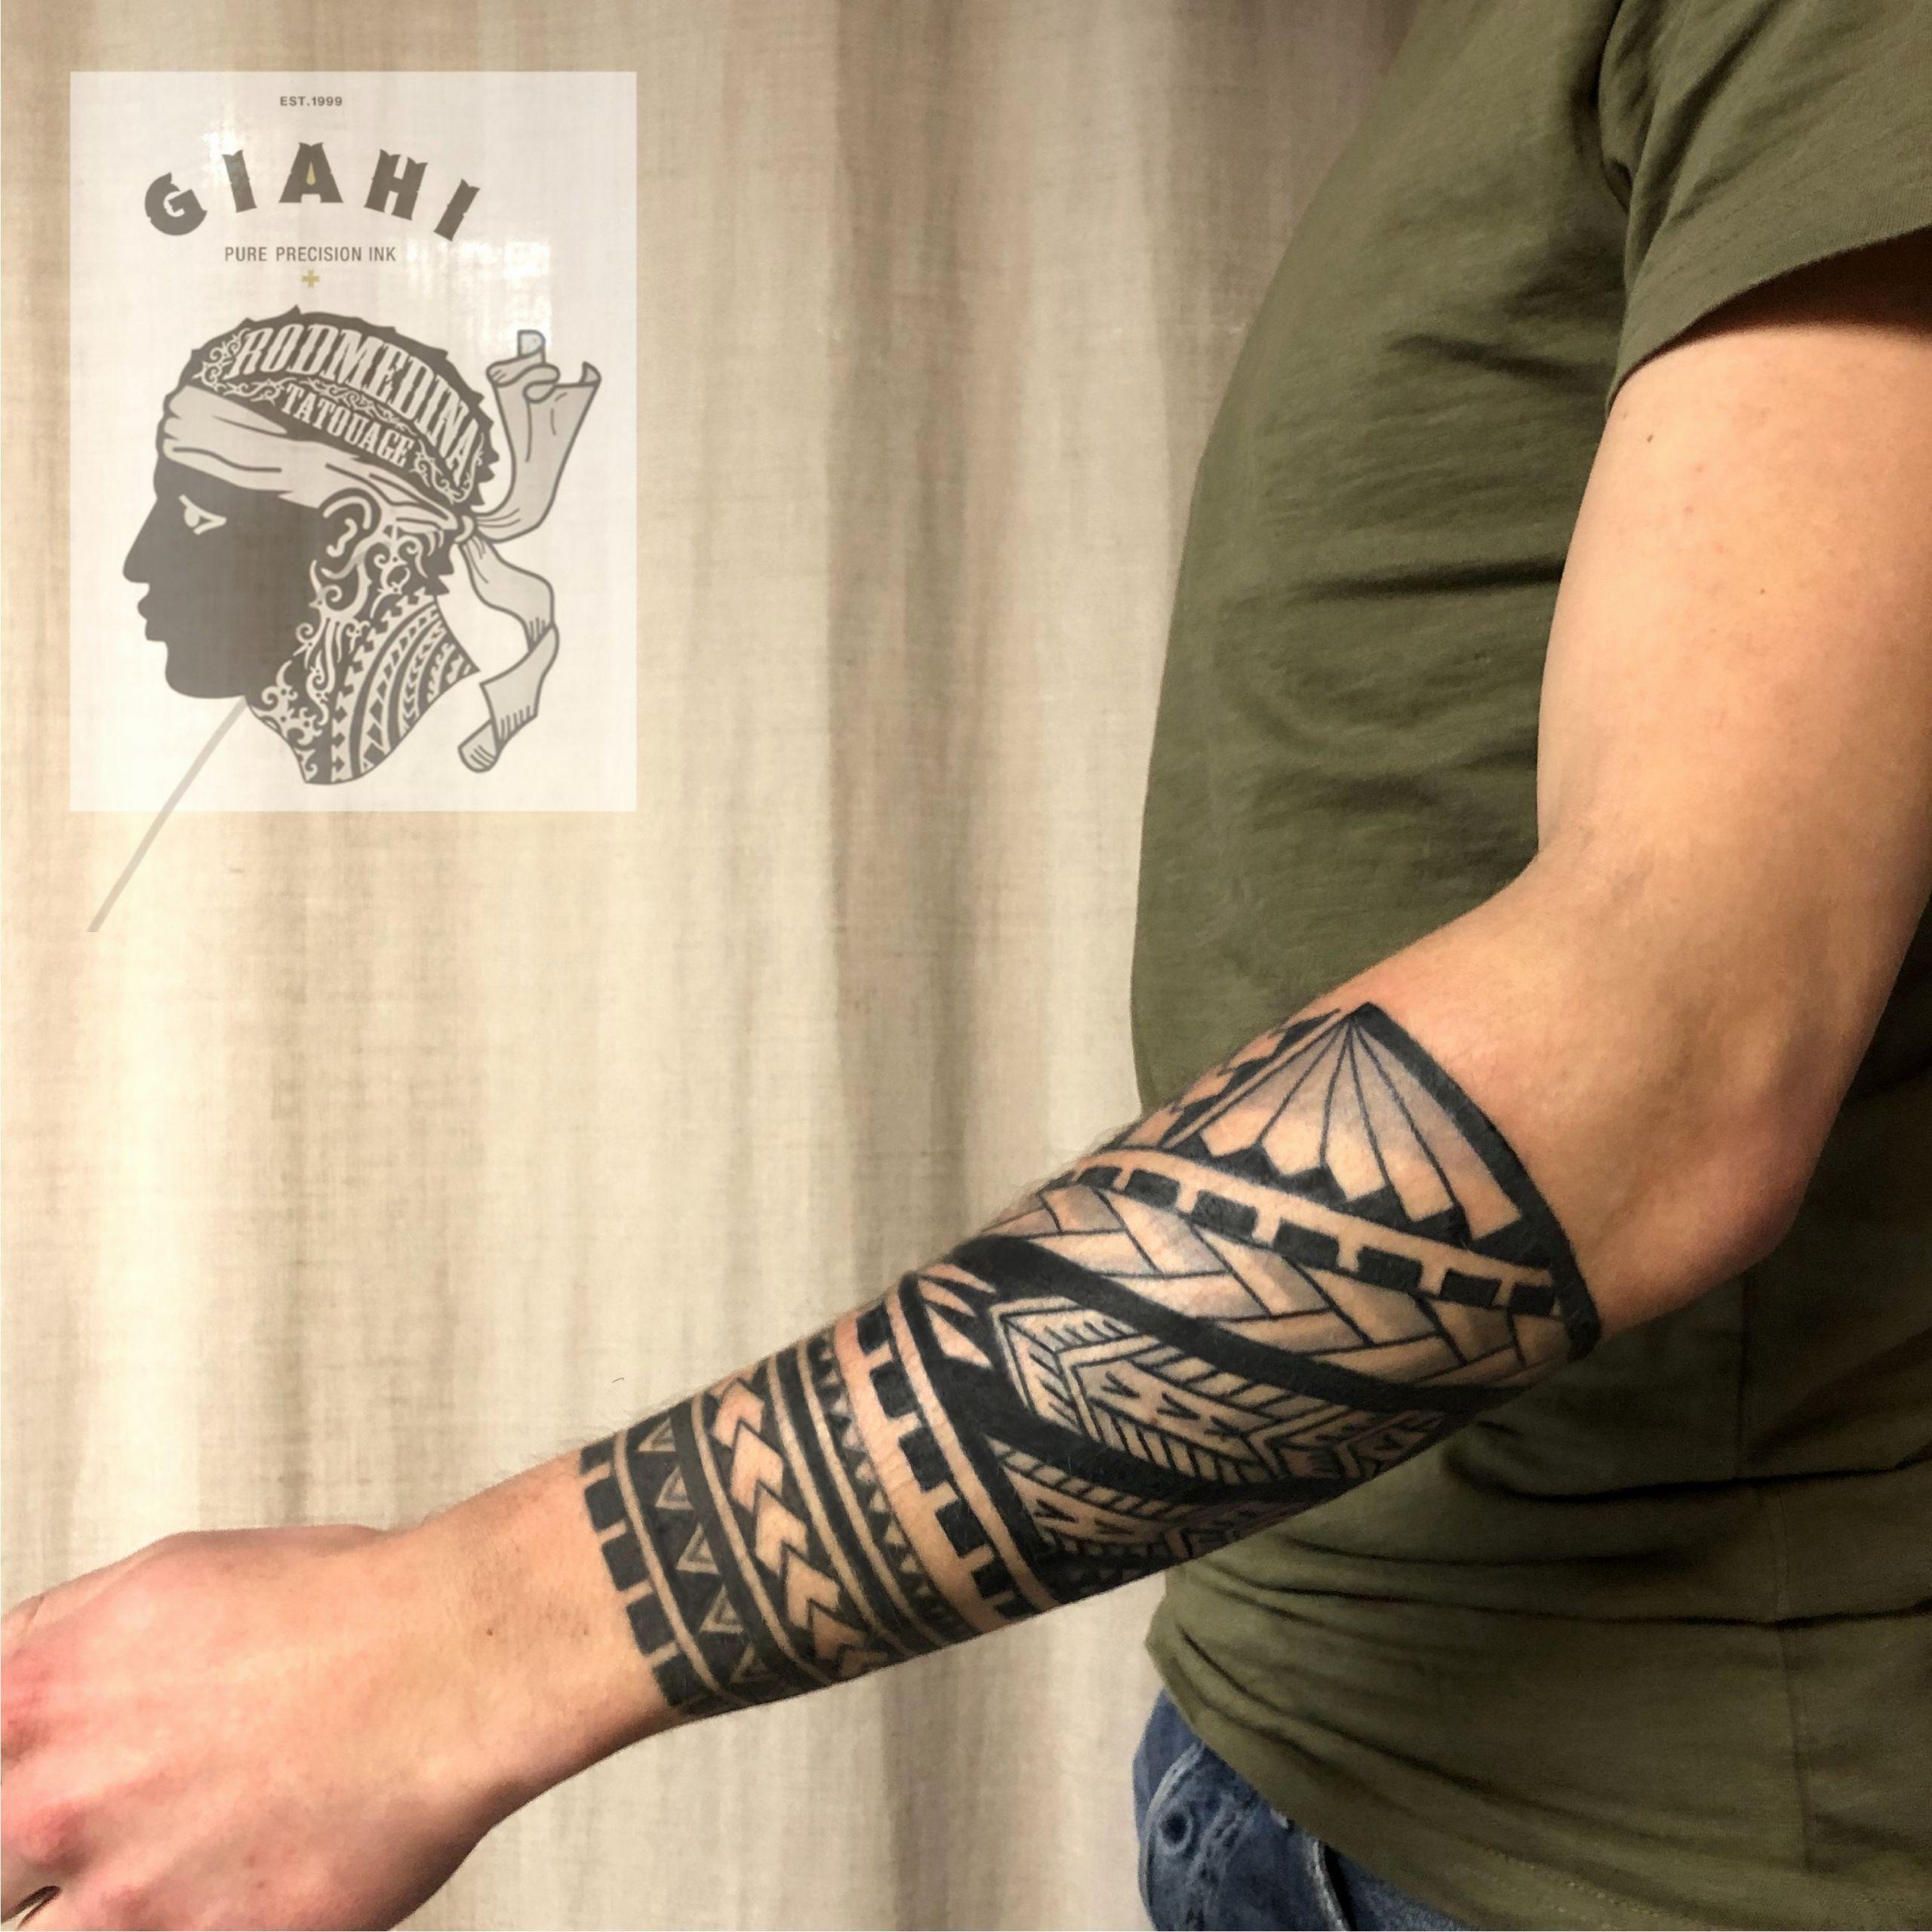 Pin By Virginie Price On Tetovalas In 2020 Maori Tattoo Designs Tribal Forearm Tattoos Tribal Arm Tattoos